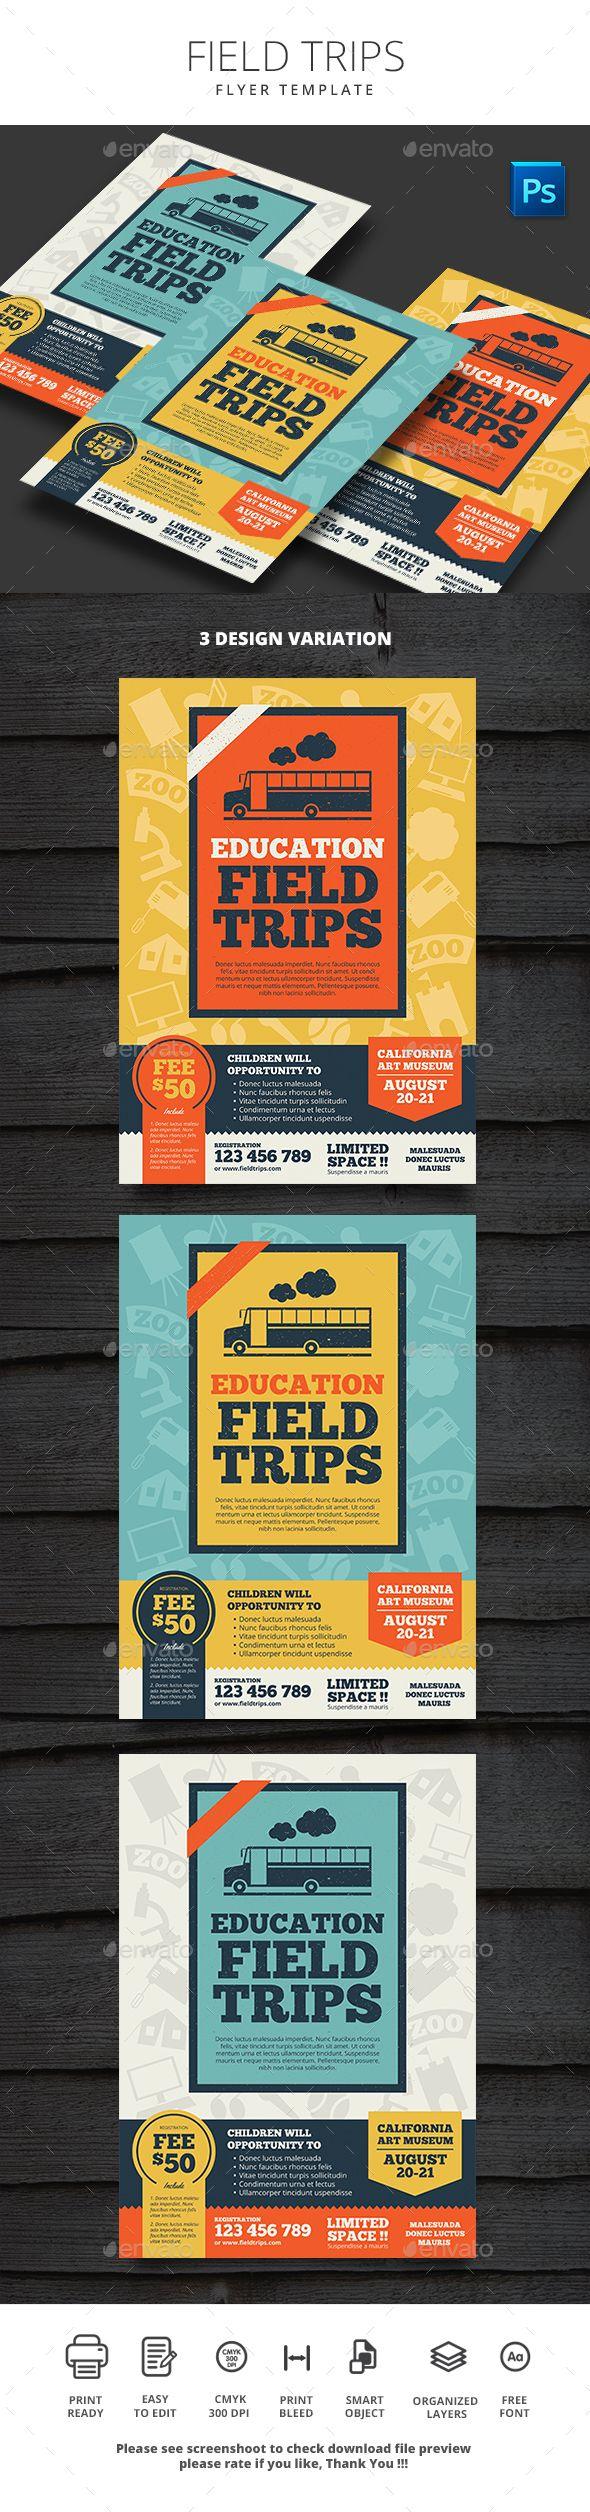 Poster design fee - Field Trips